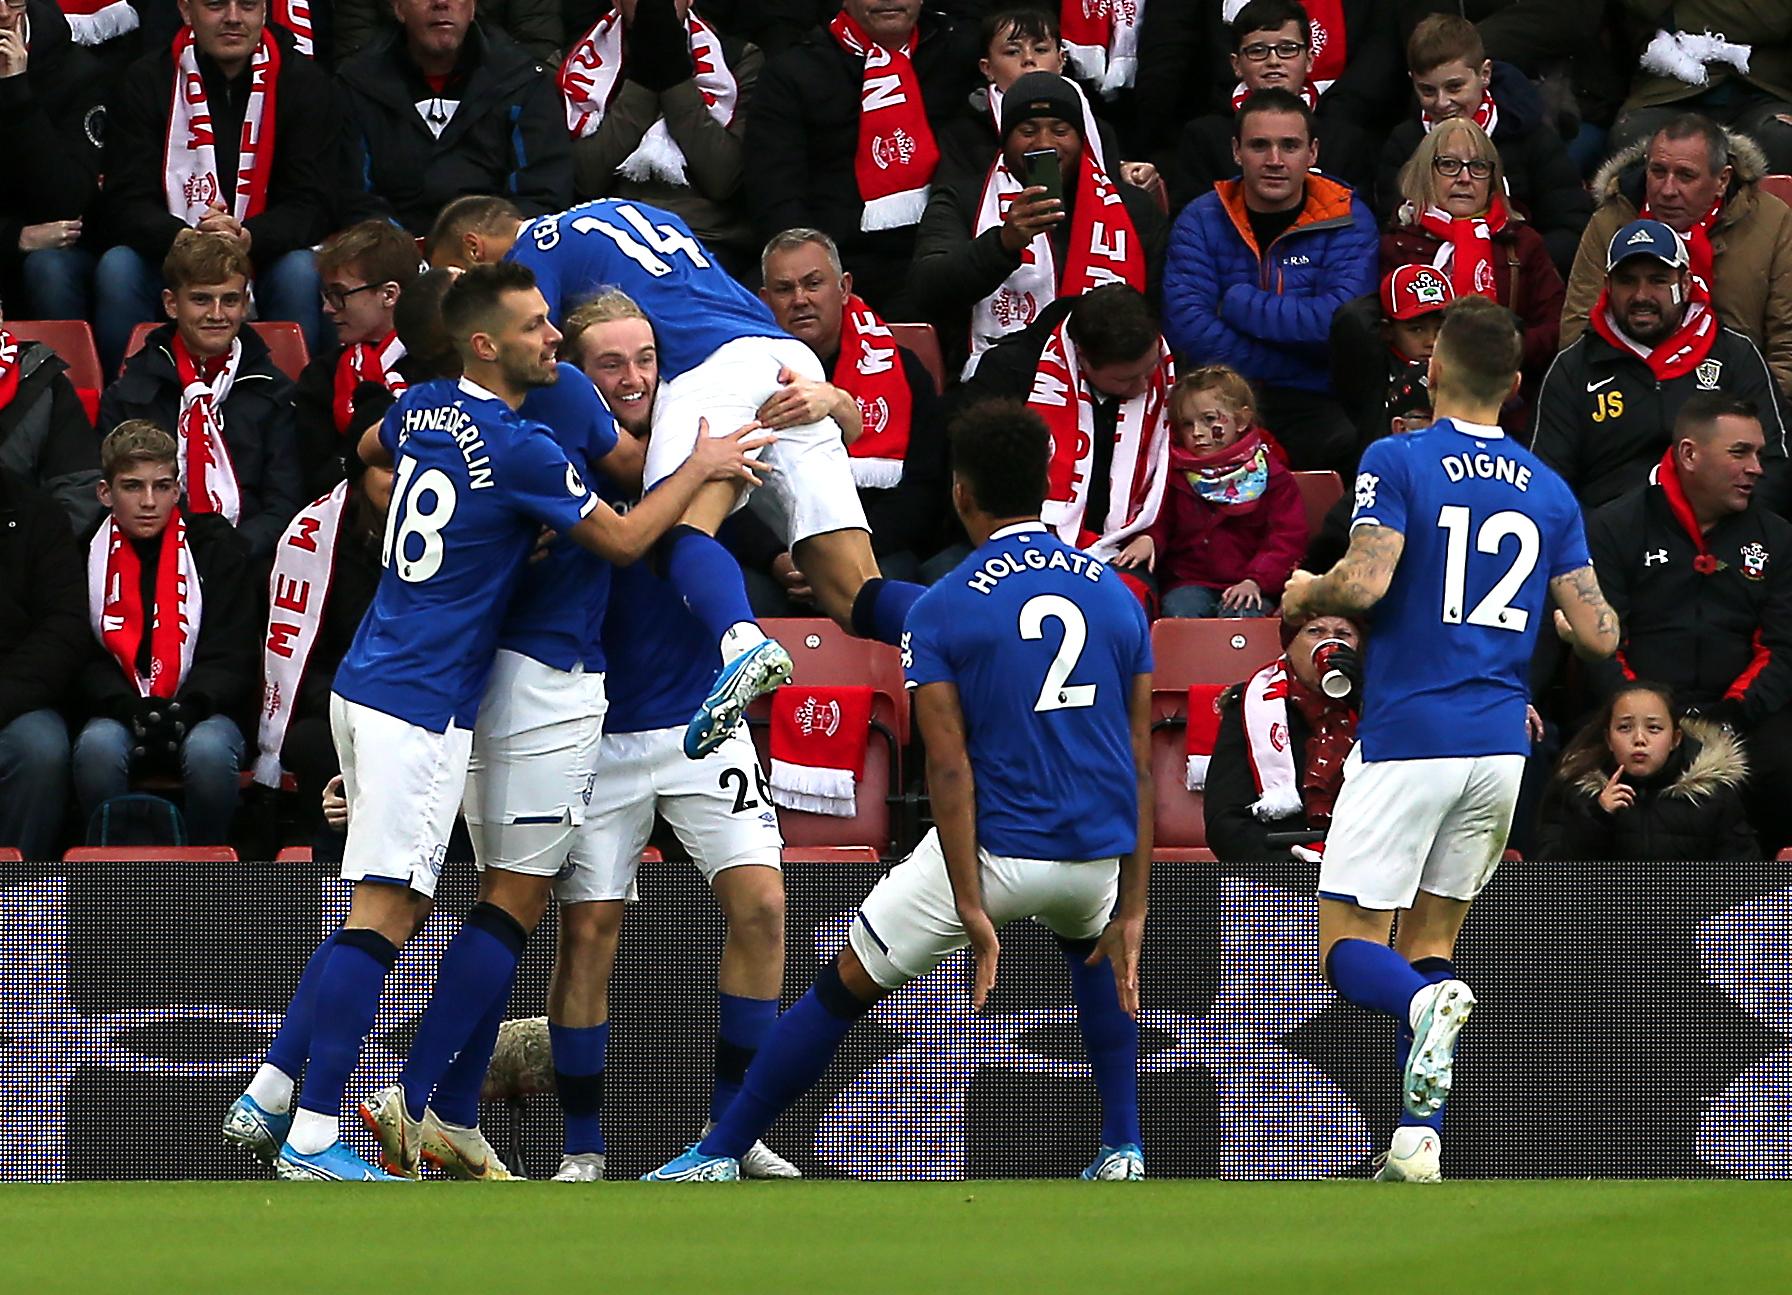 Southampton v Everton - Premier League - St Mary's Stadium